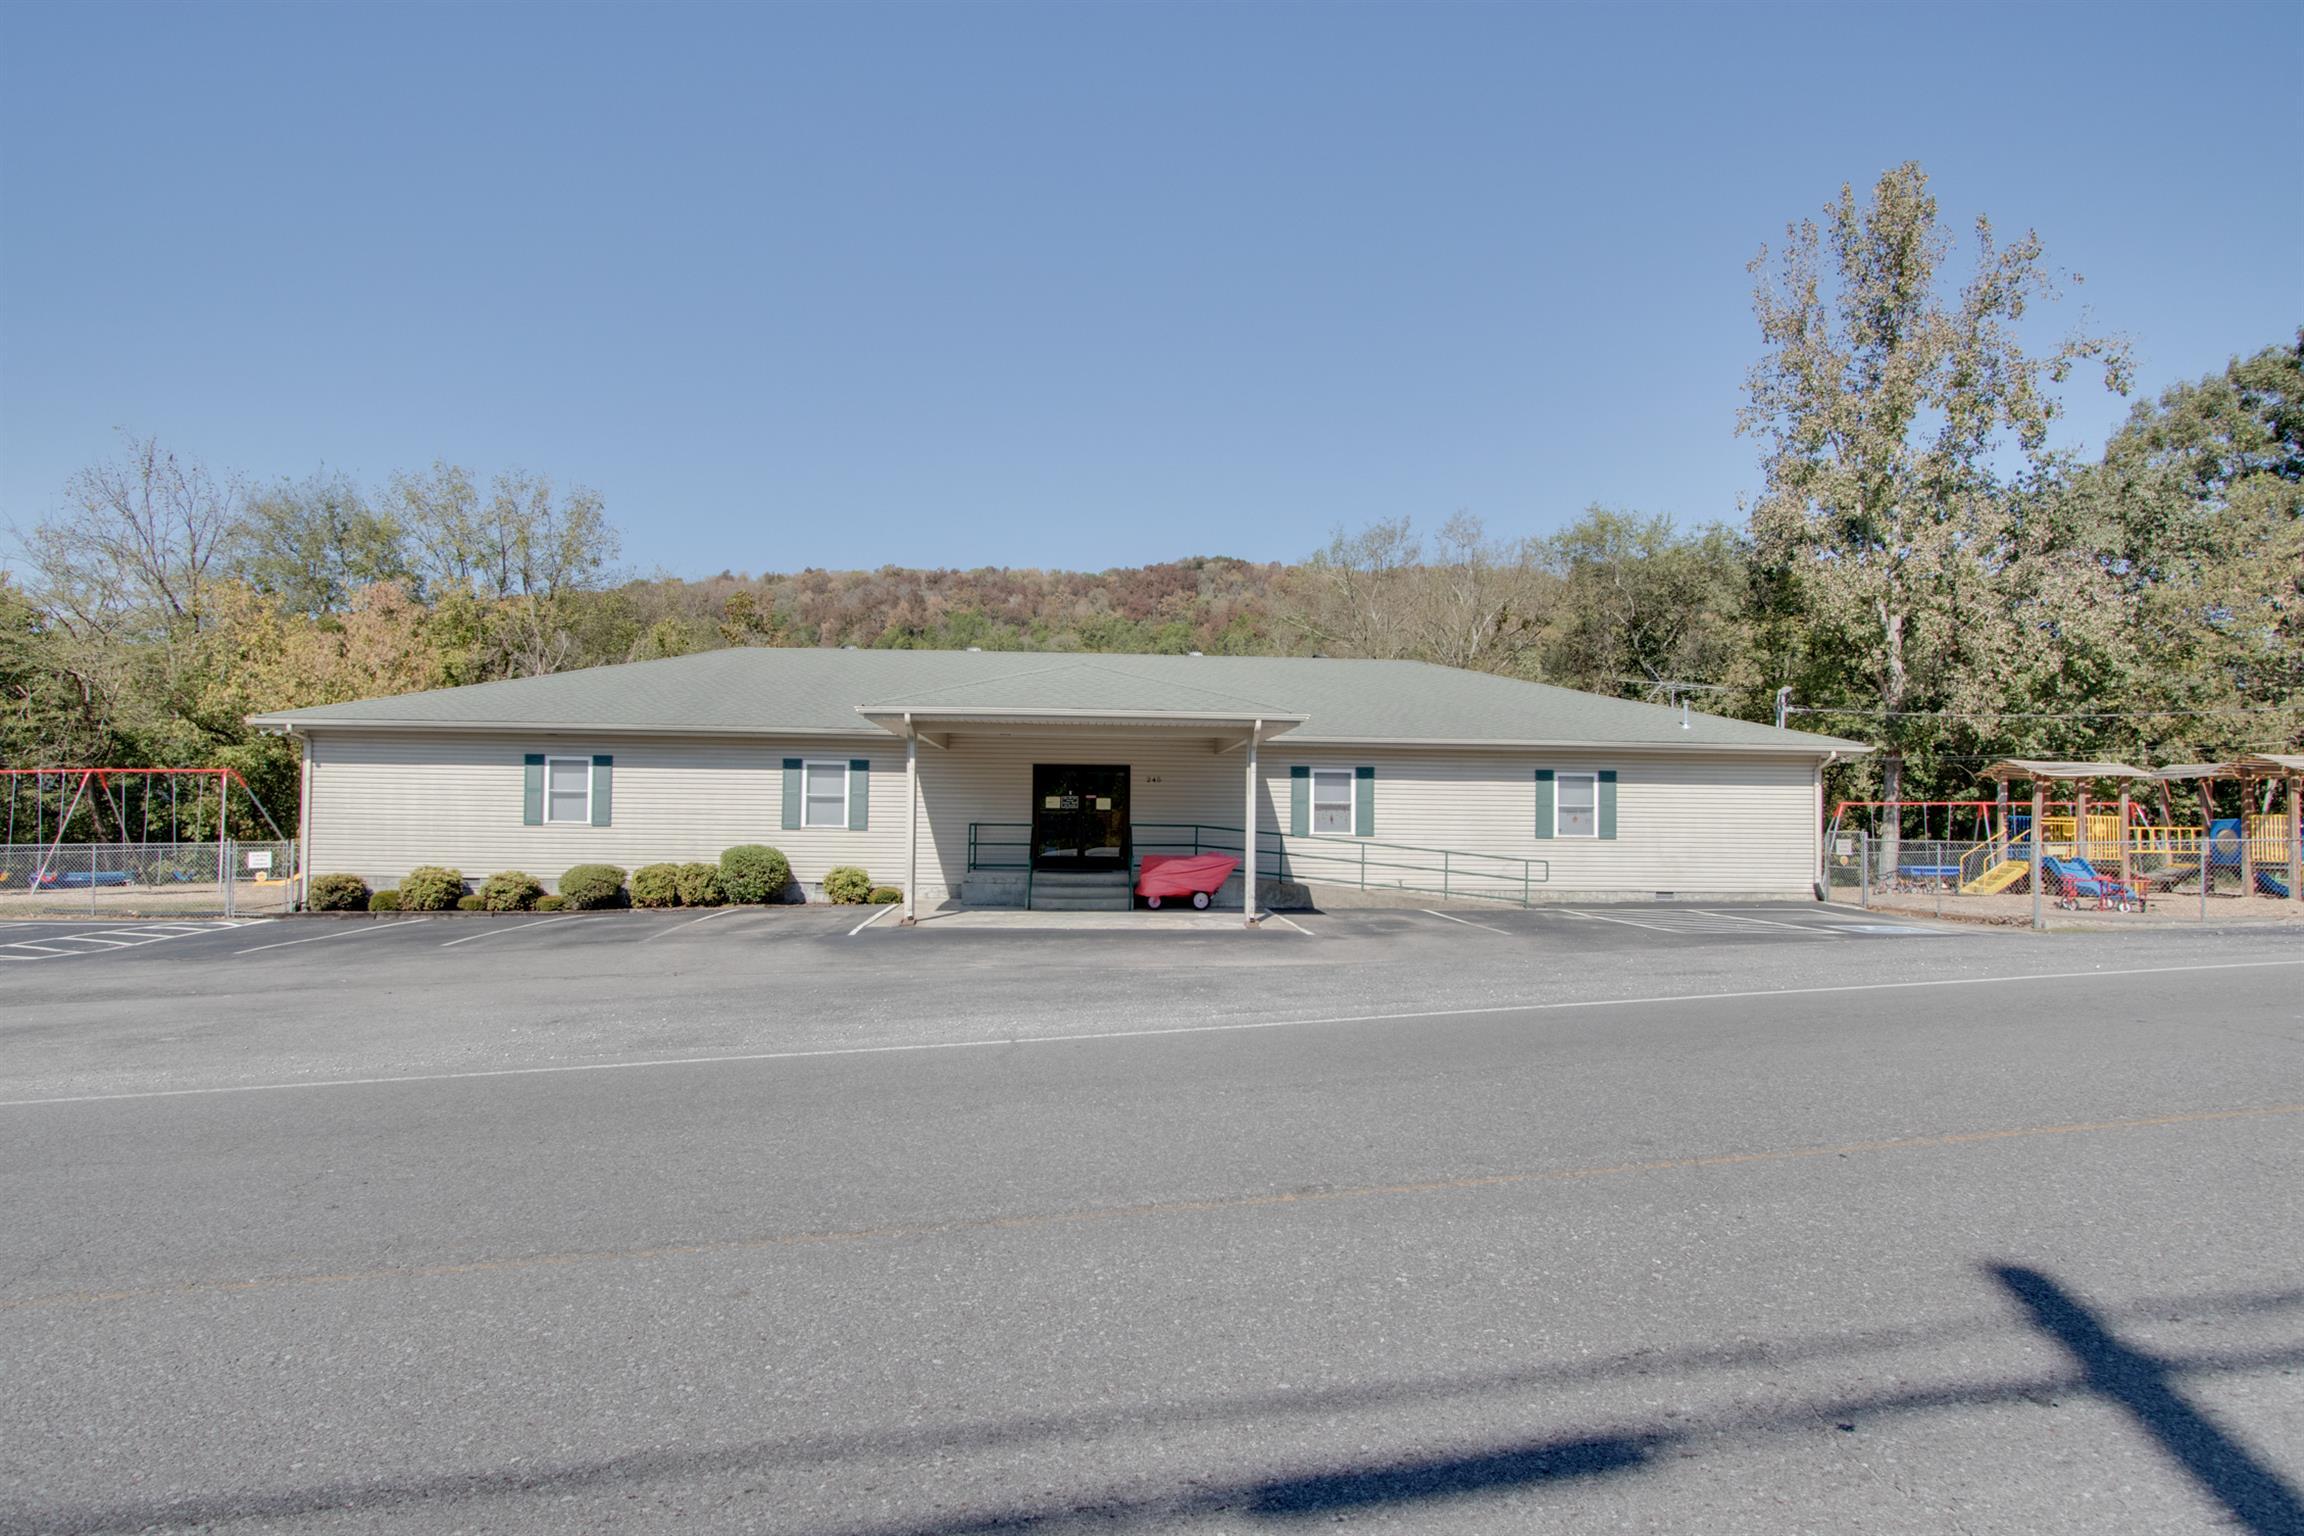 245 Jmz Dr Property Photo - Gordonsville, TN real estate listing